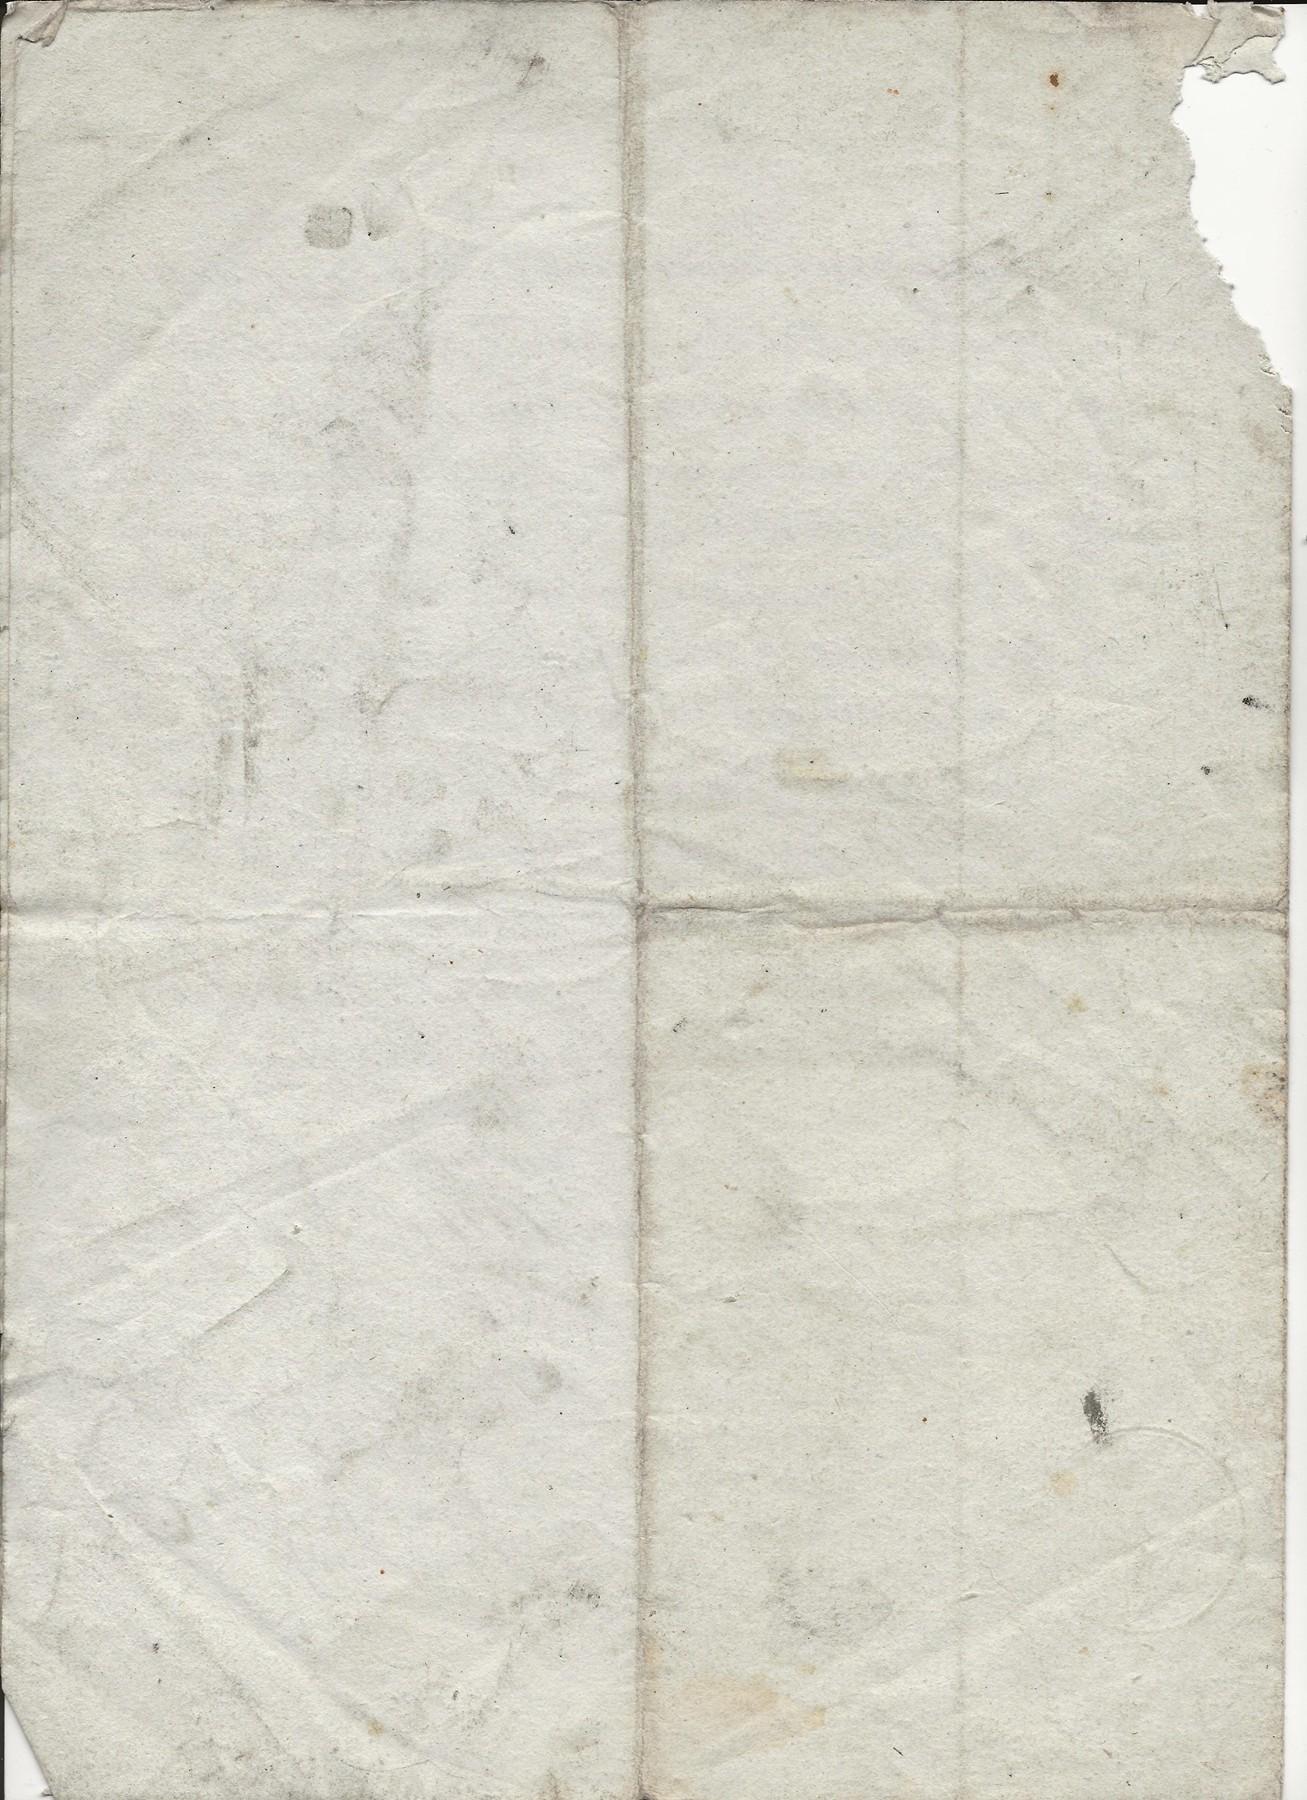 1821 vente herbet a pierre joseph pruvot 004